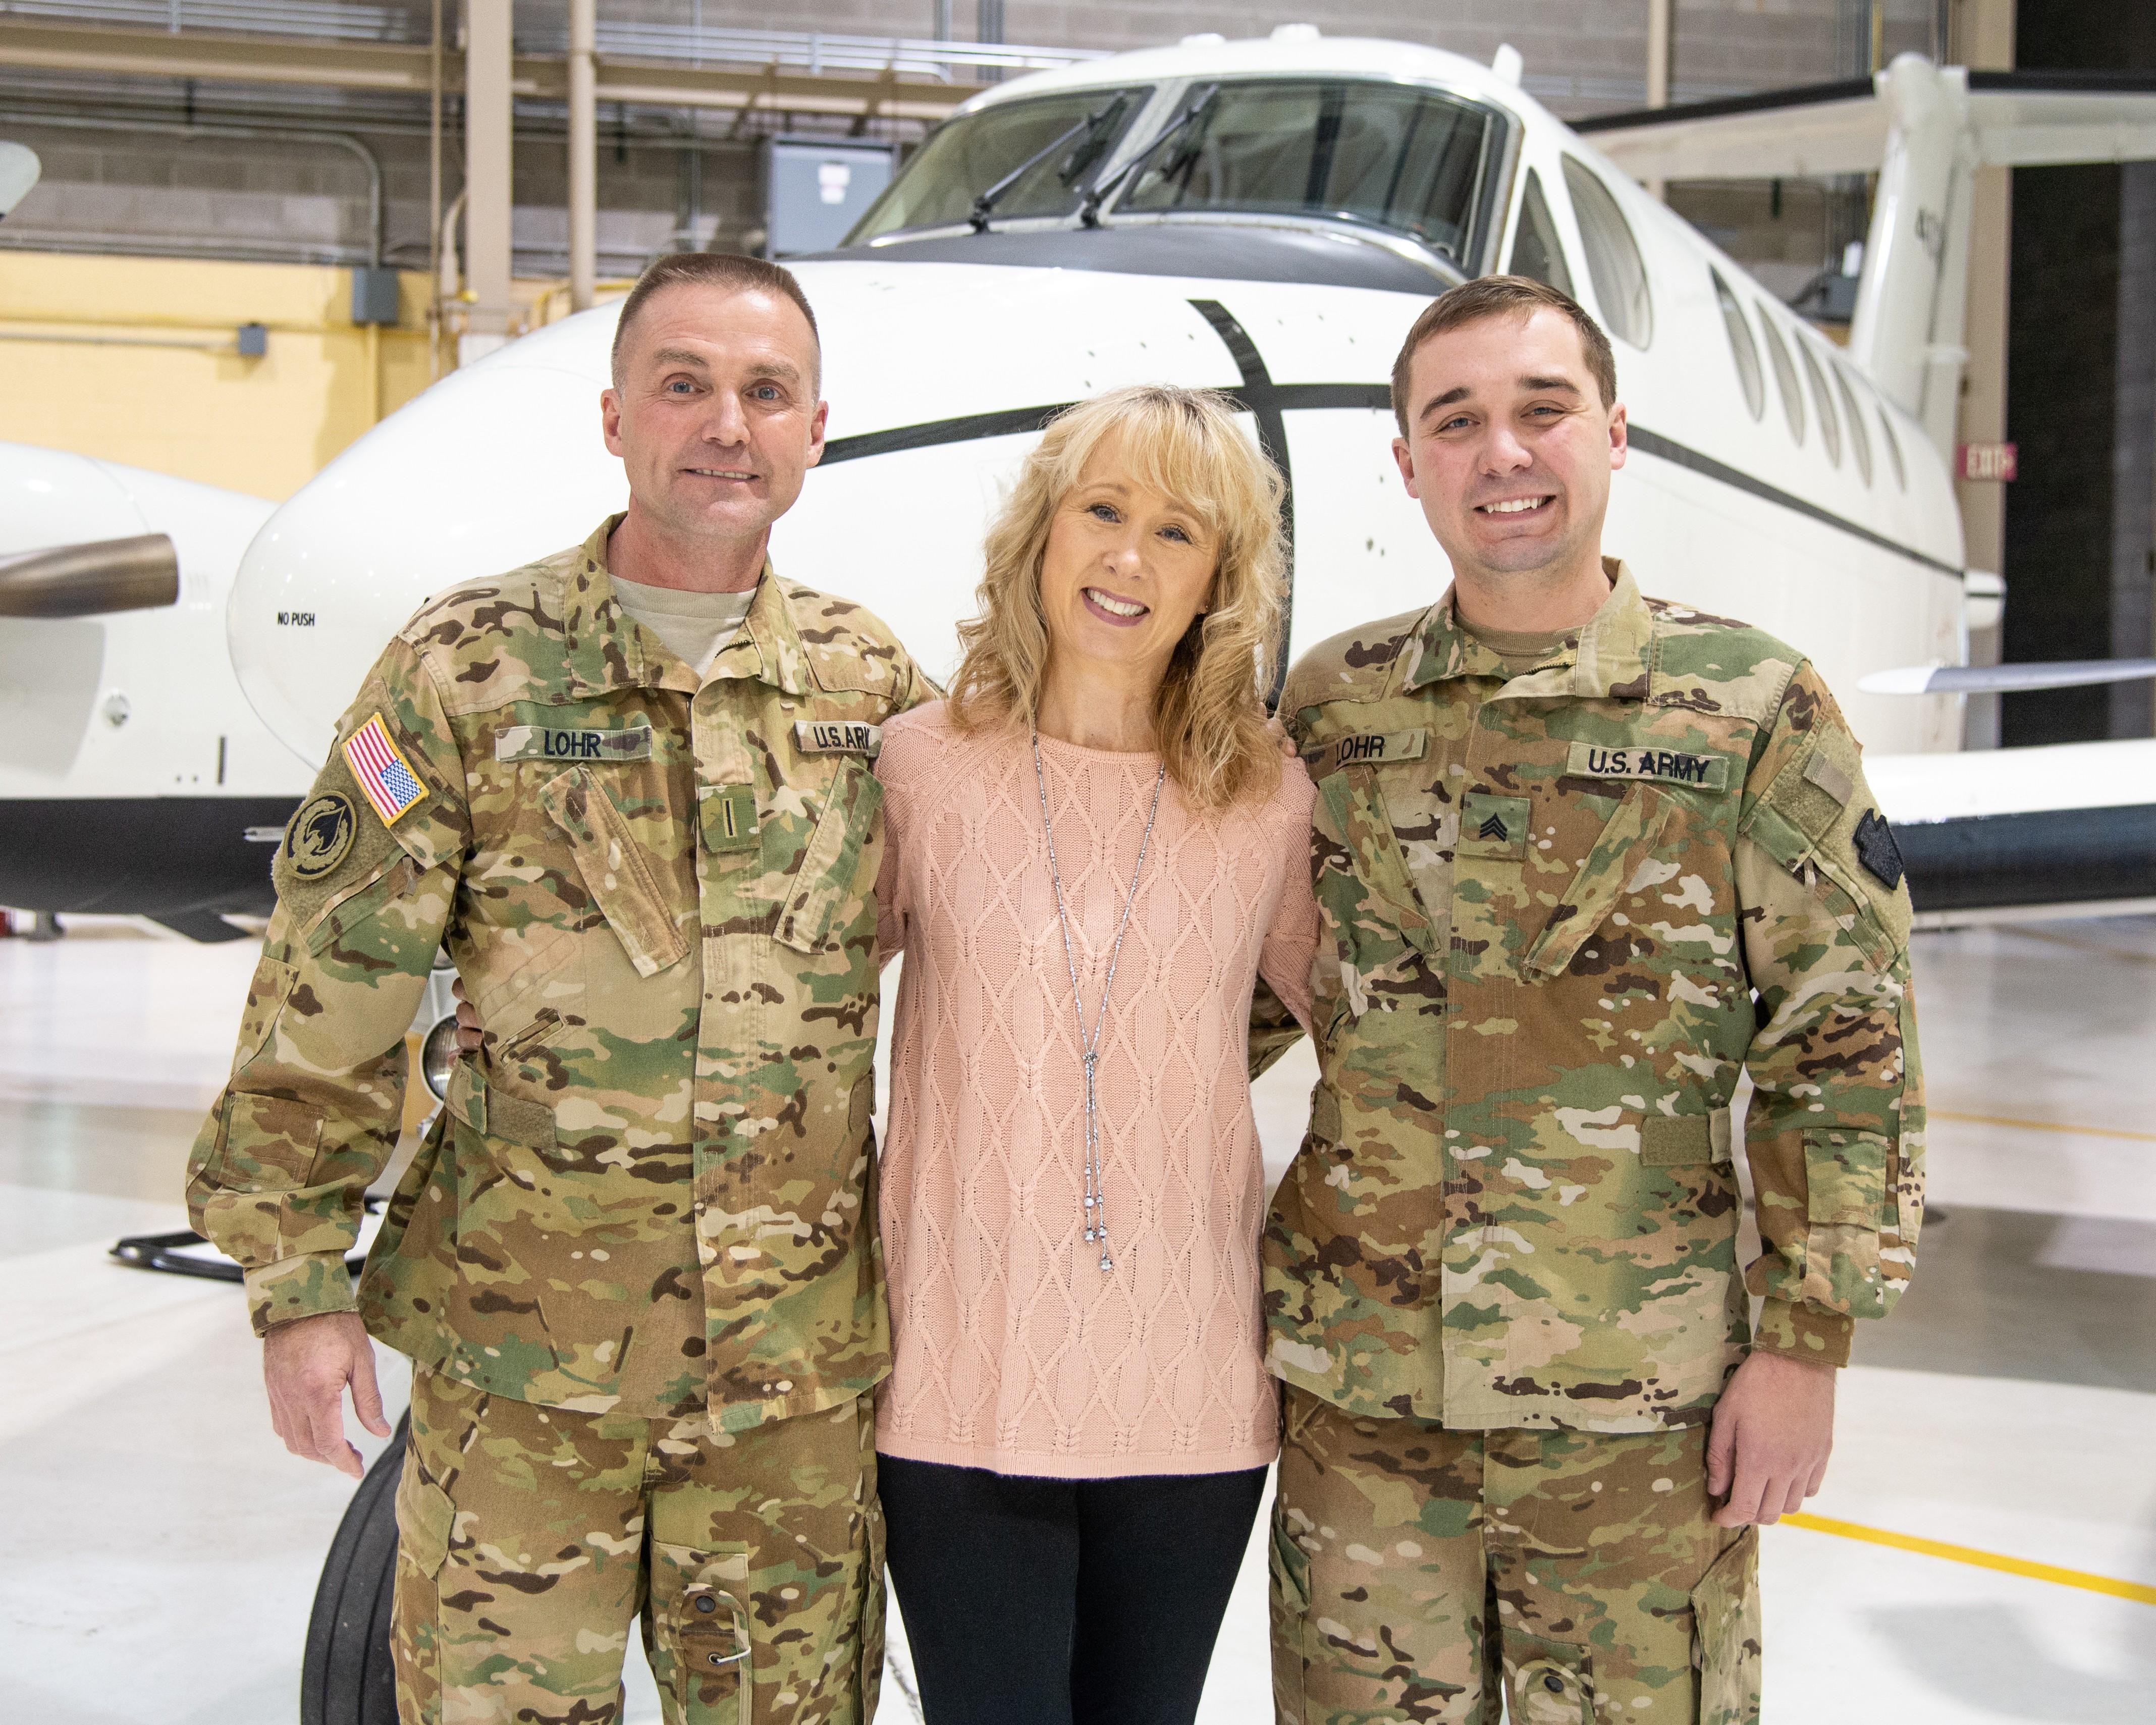 National Guard service strengthens West Virginia Family  e2513bdbb